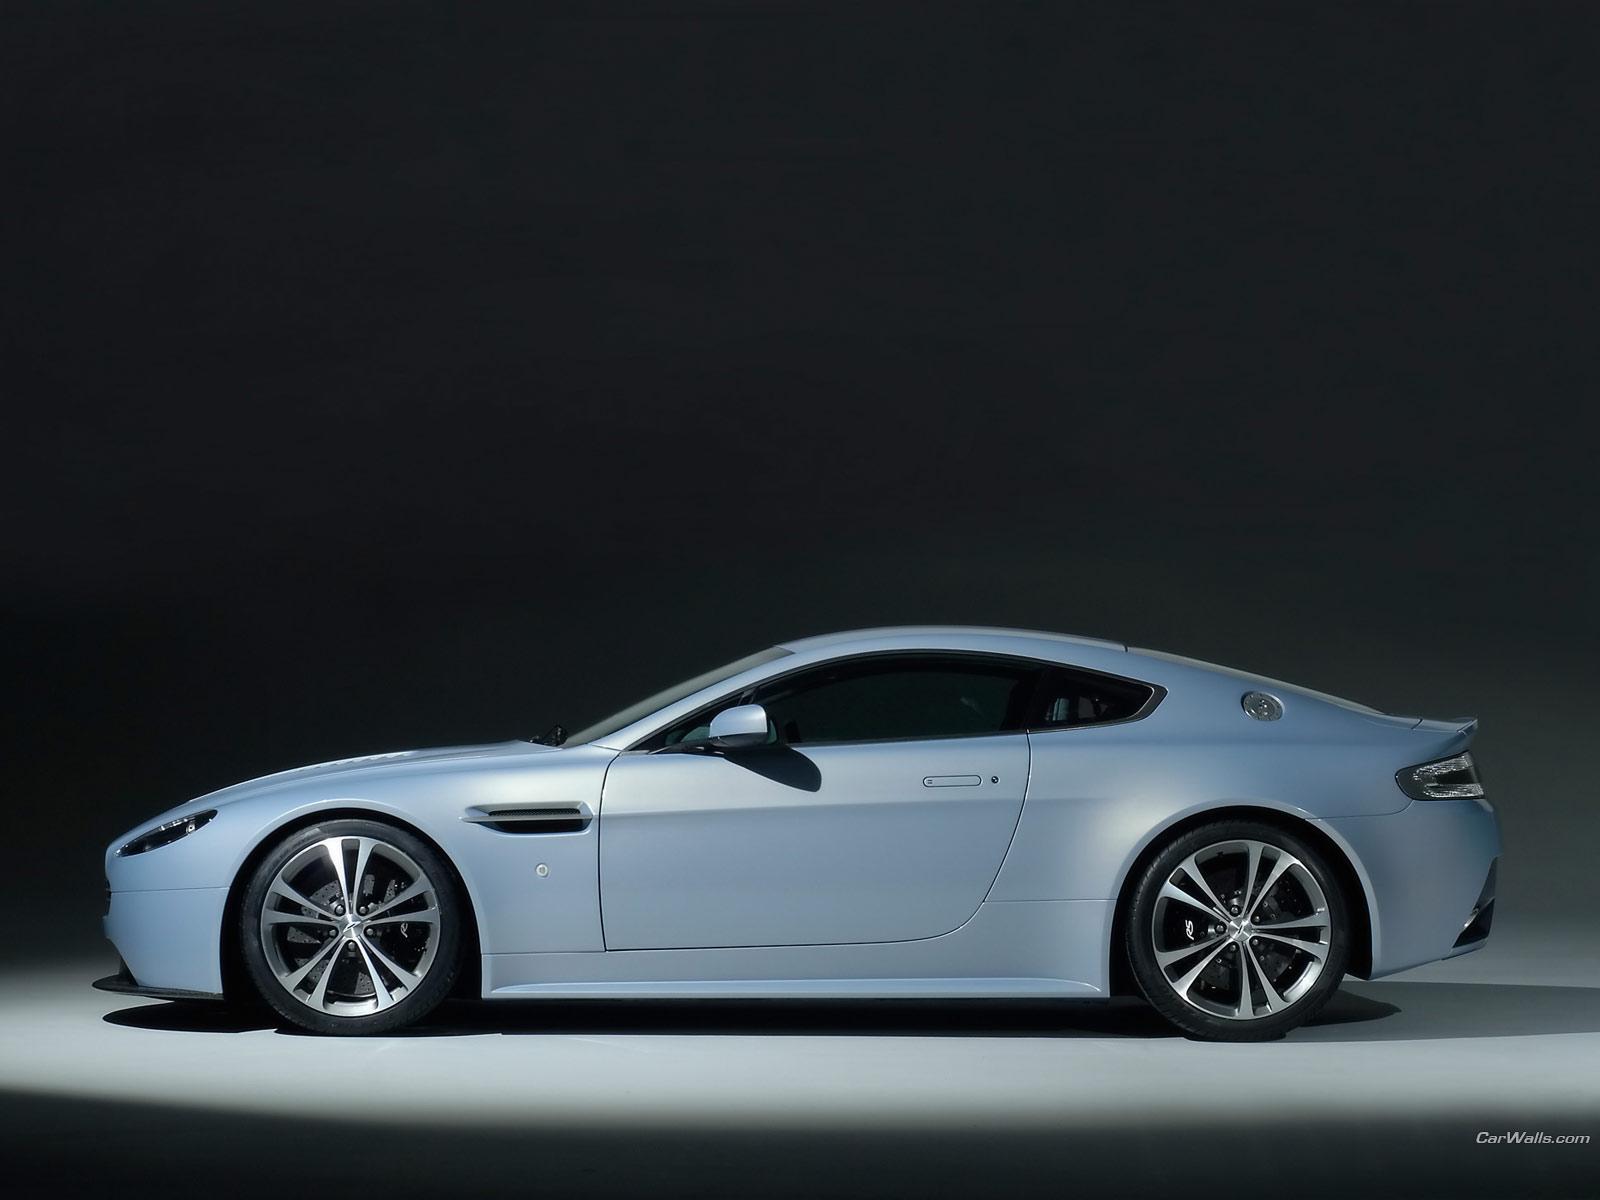 http://4.bp.blogspot.com/-q_7jKVUuChU/ThIlJ_g9NjI/AAAAAAAAAbM/BhJLkybJkWY/s1600/Aston-Martin_vantage-V12_203_1600x1200.jpg